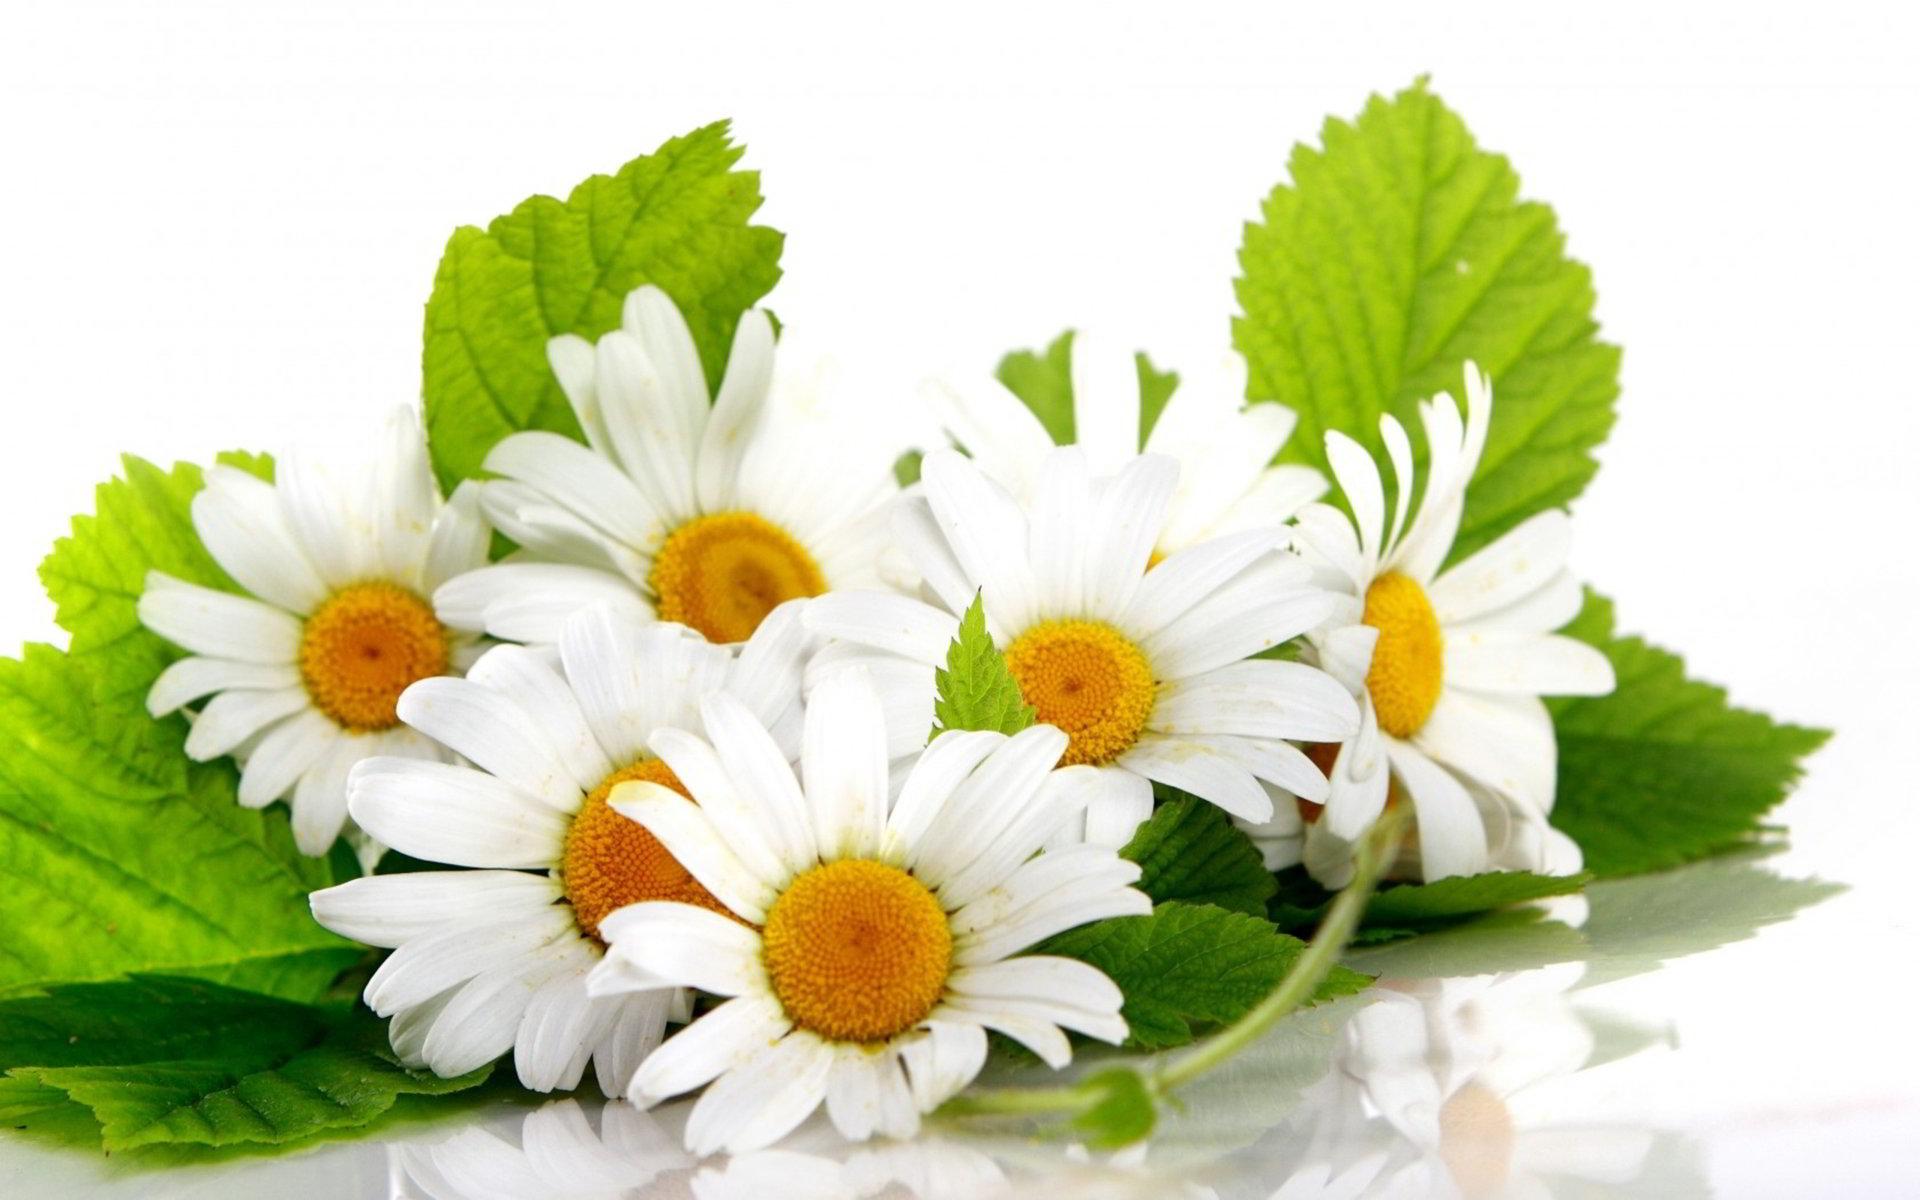 hinh anh hoa cuc dep 23